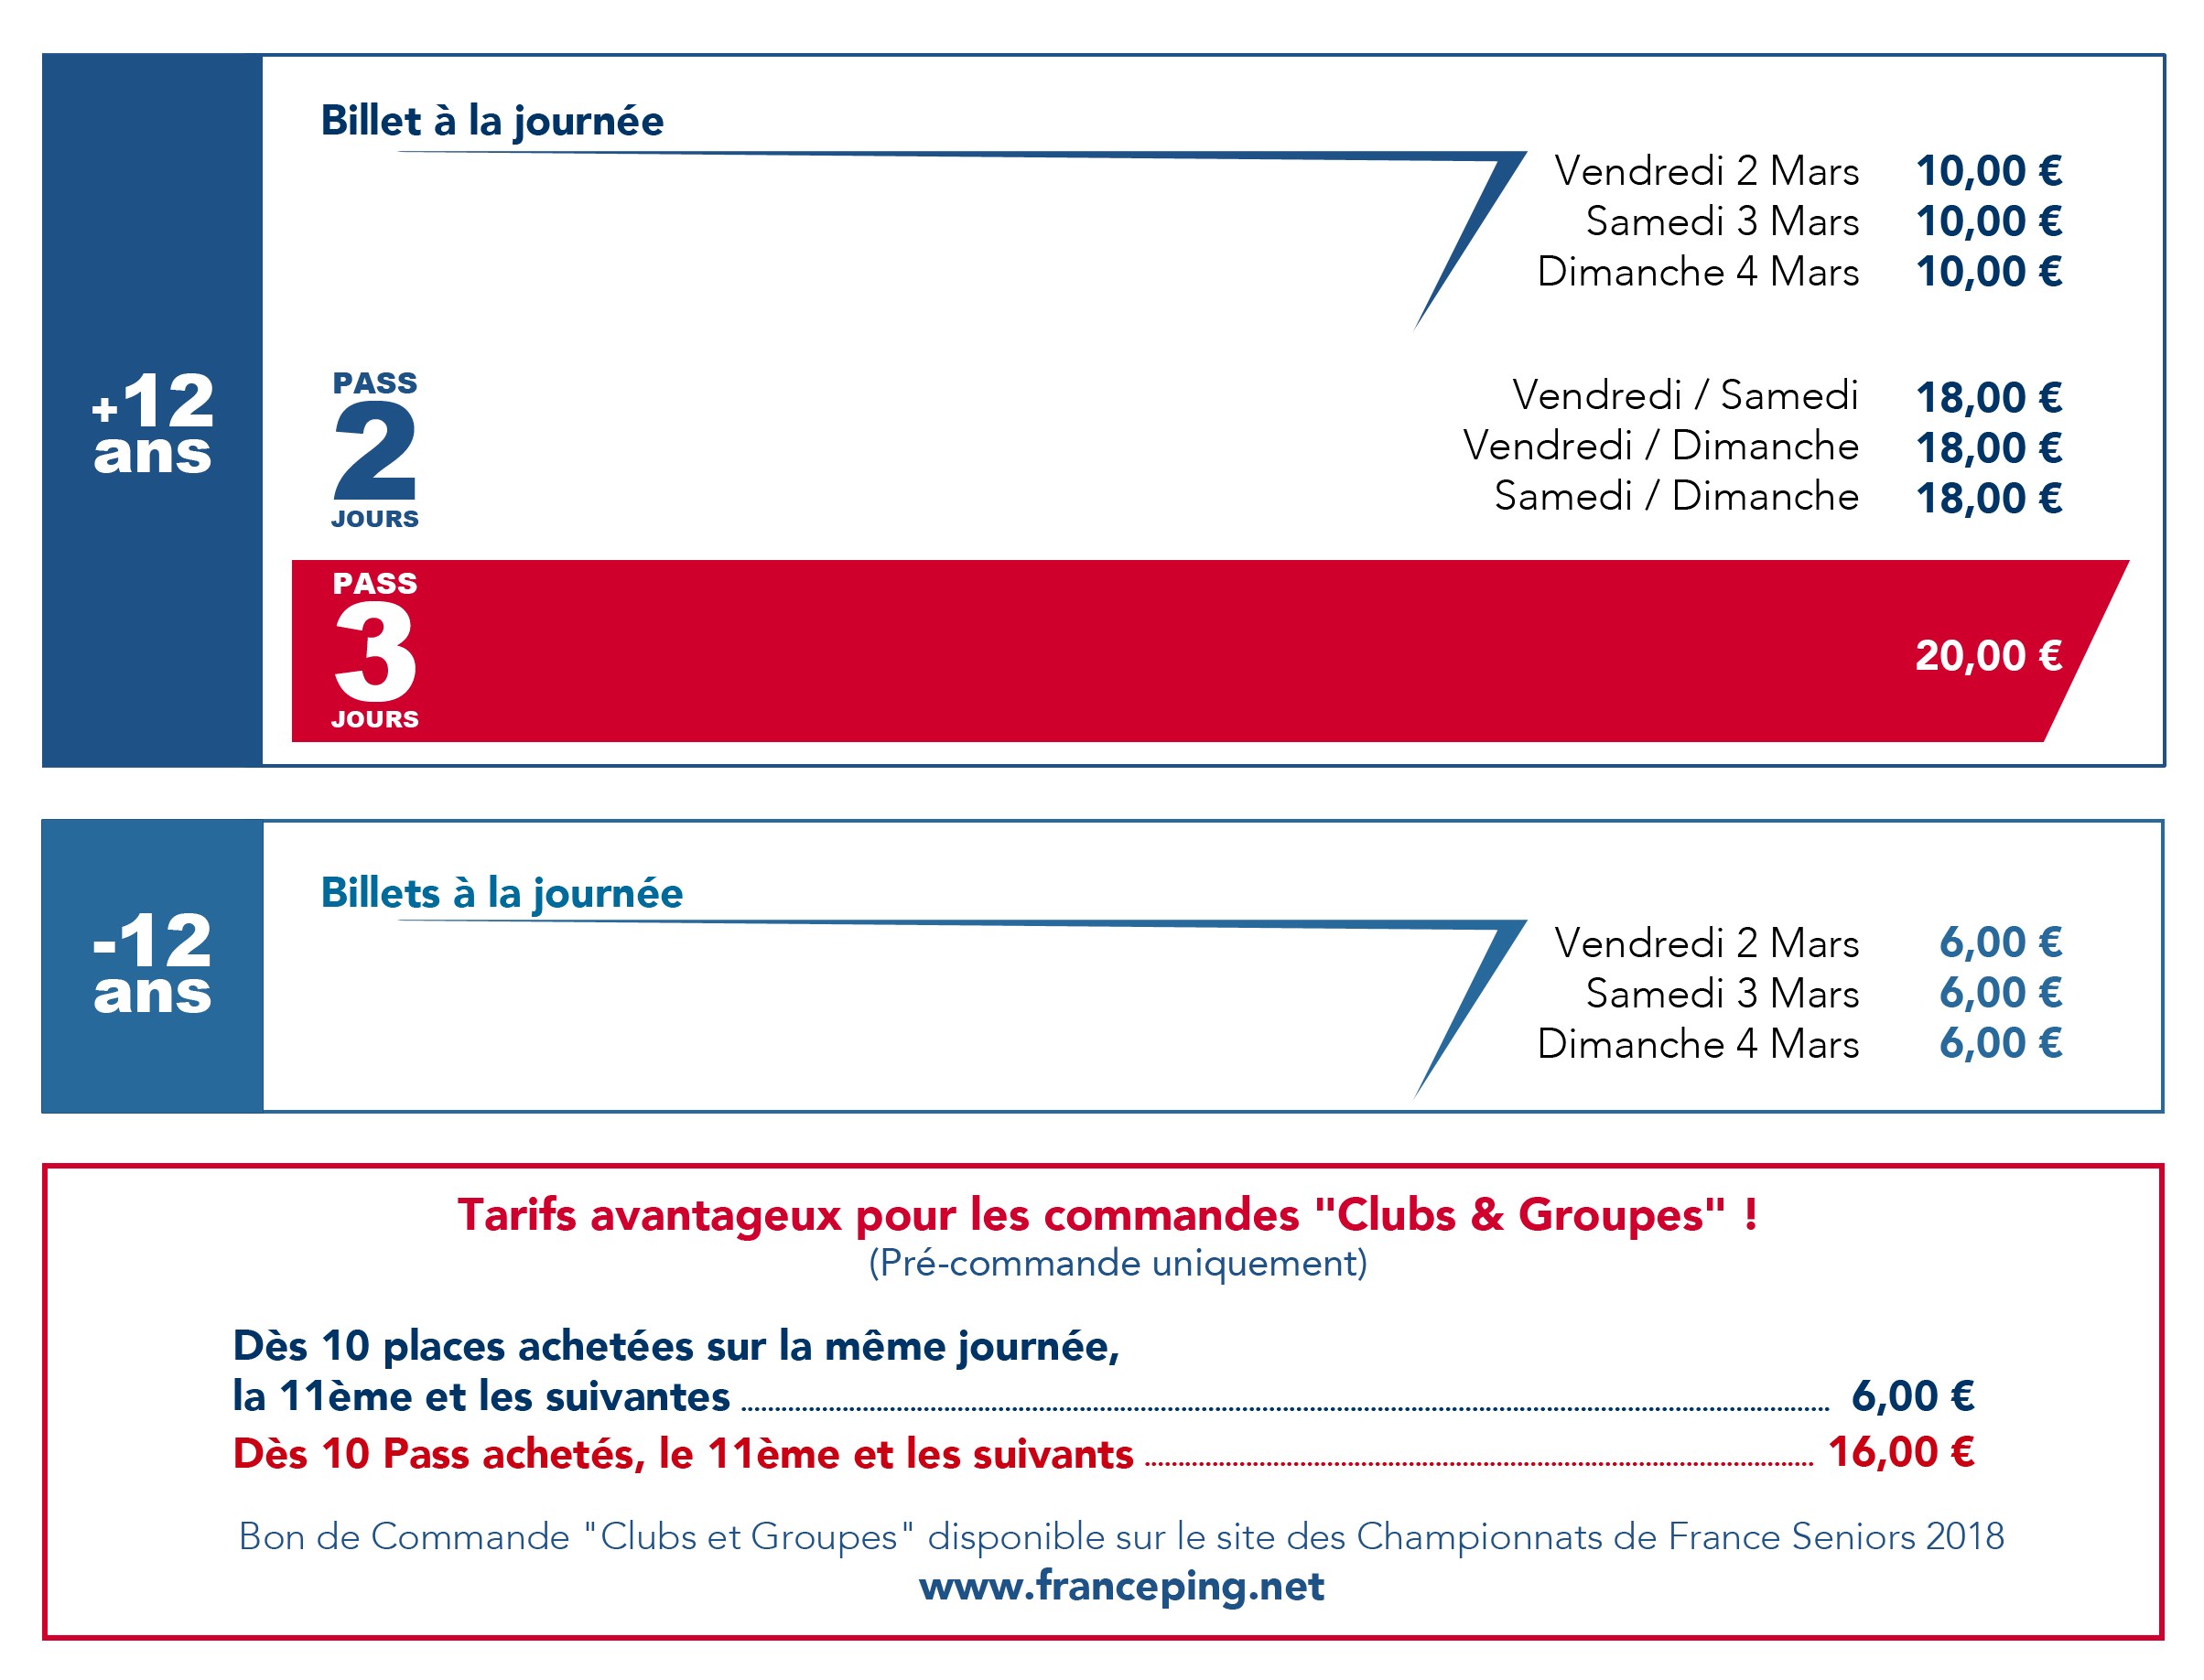 tableau-tarifs-billeterie-france2018.jpg